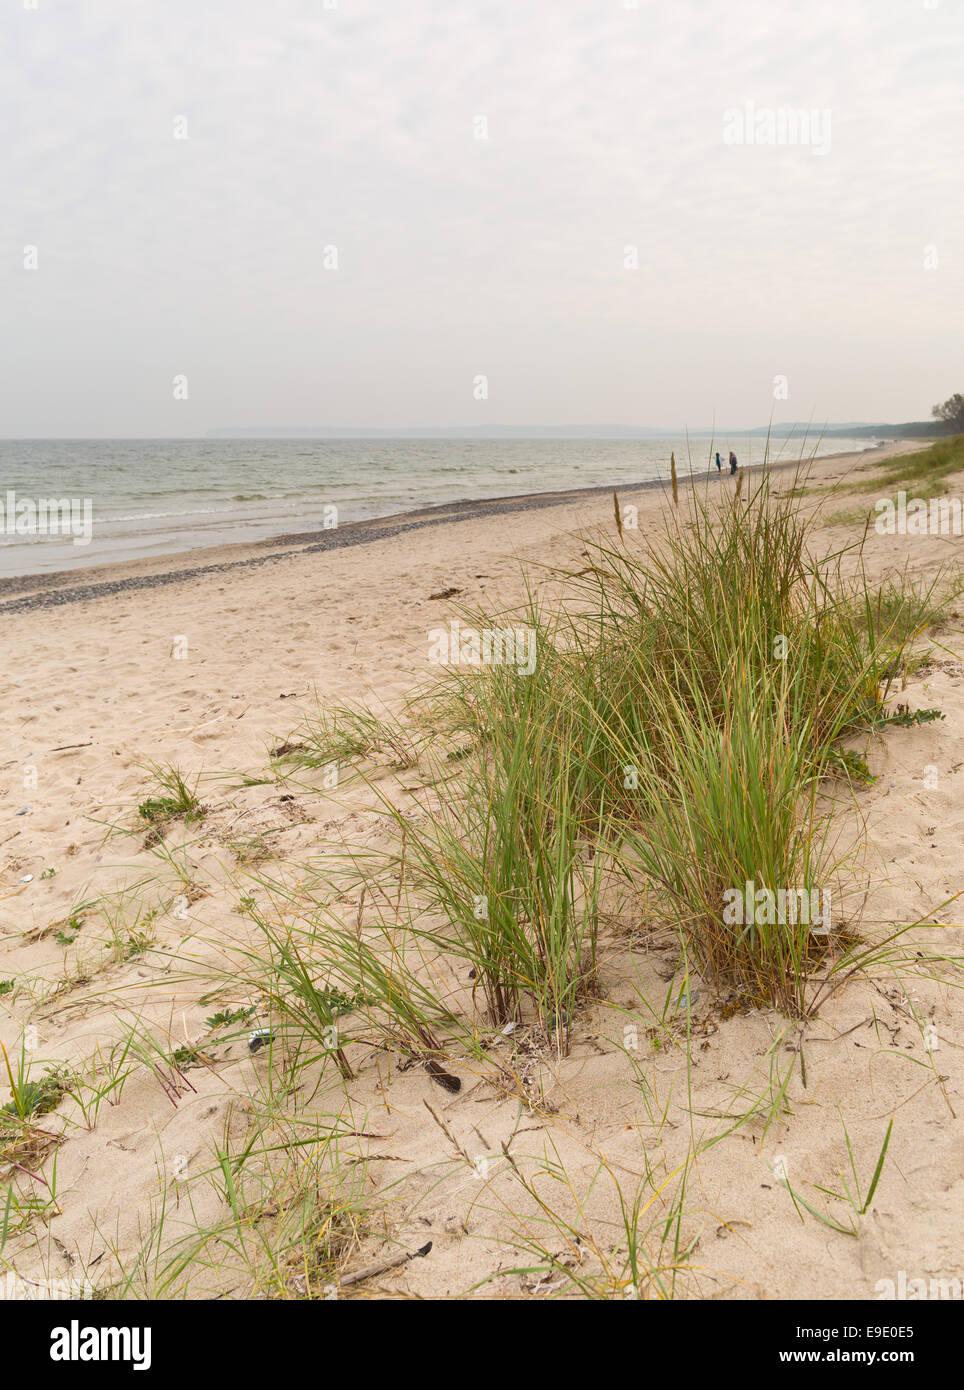 Marram at the beach near Prora, Ruegen, Germany, Europe - Stock Image